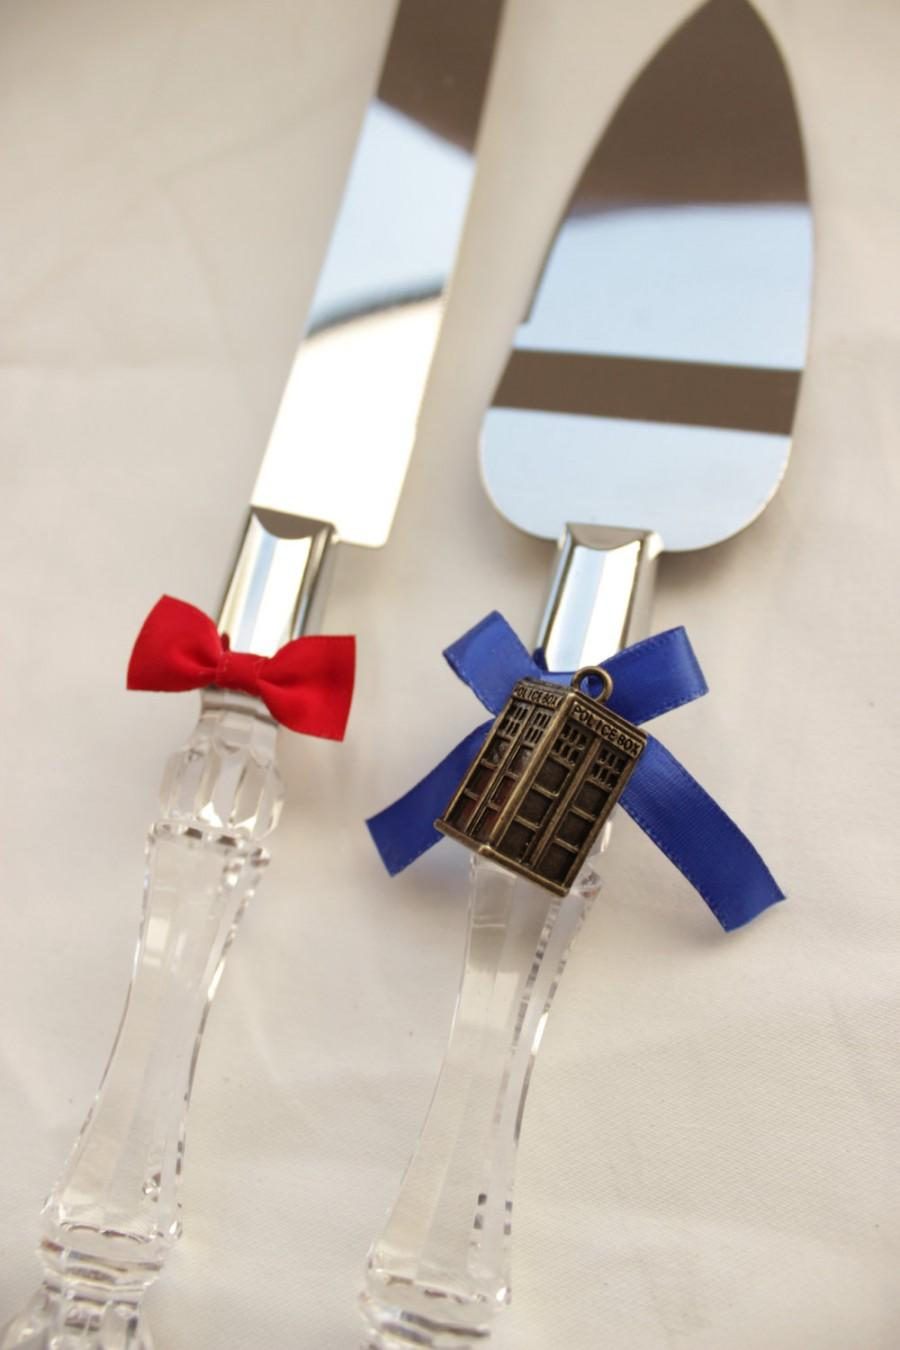 Wedding Cake Server And Knife Tardis And Bowtie Wedding Cake Cutter